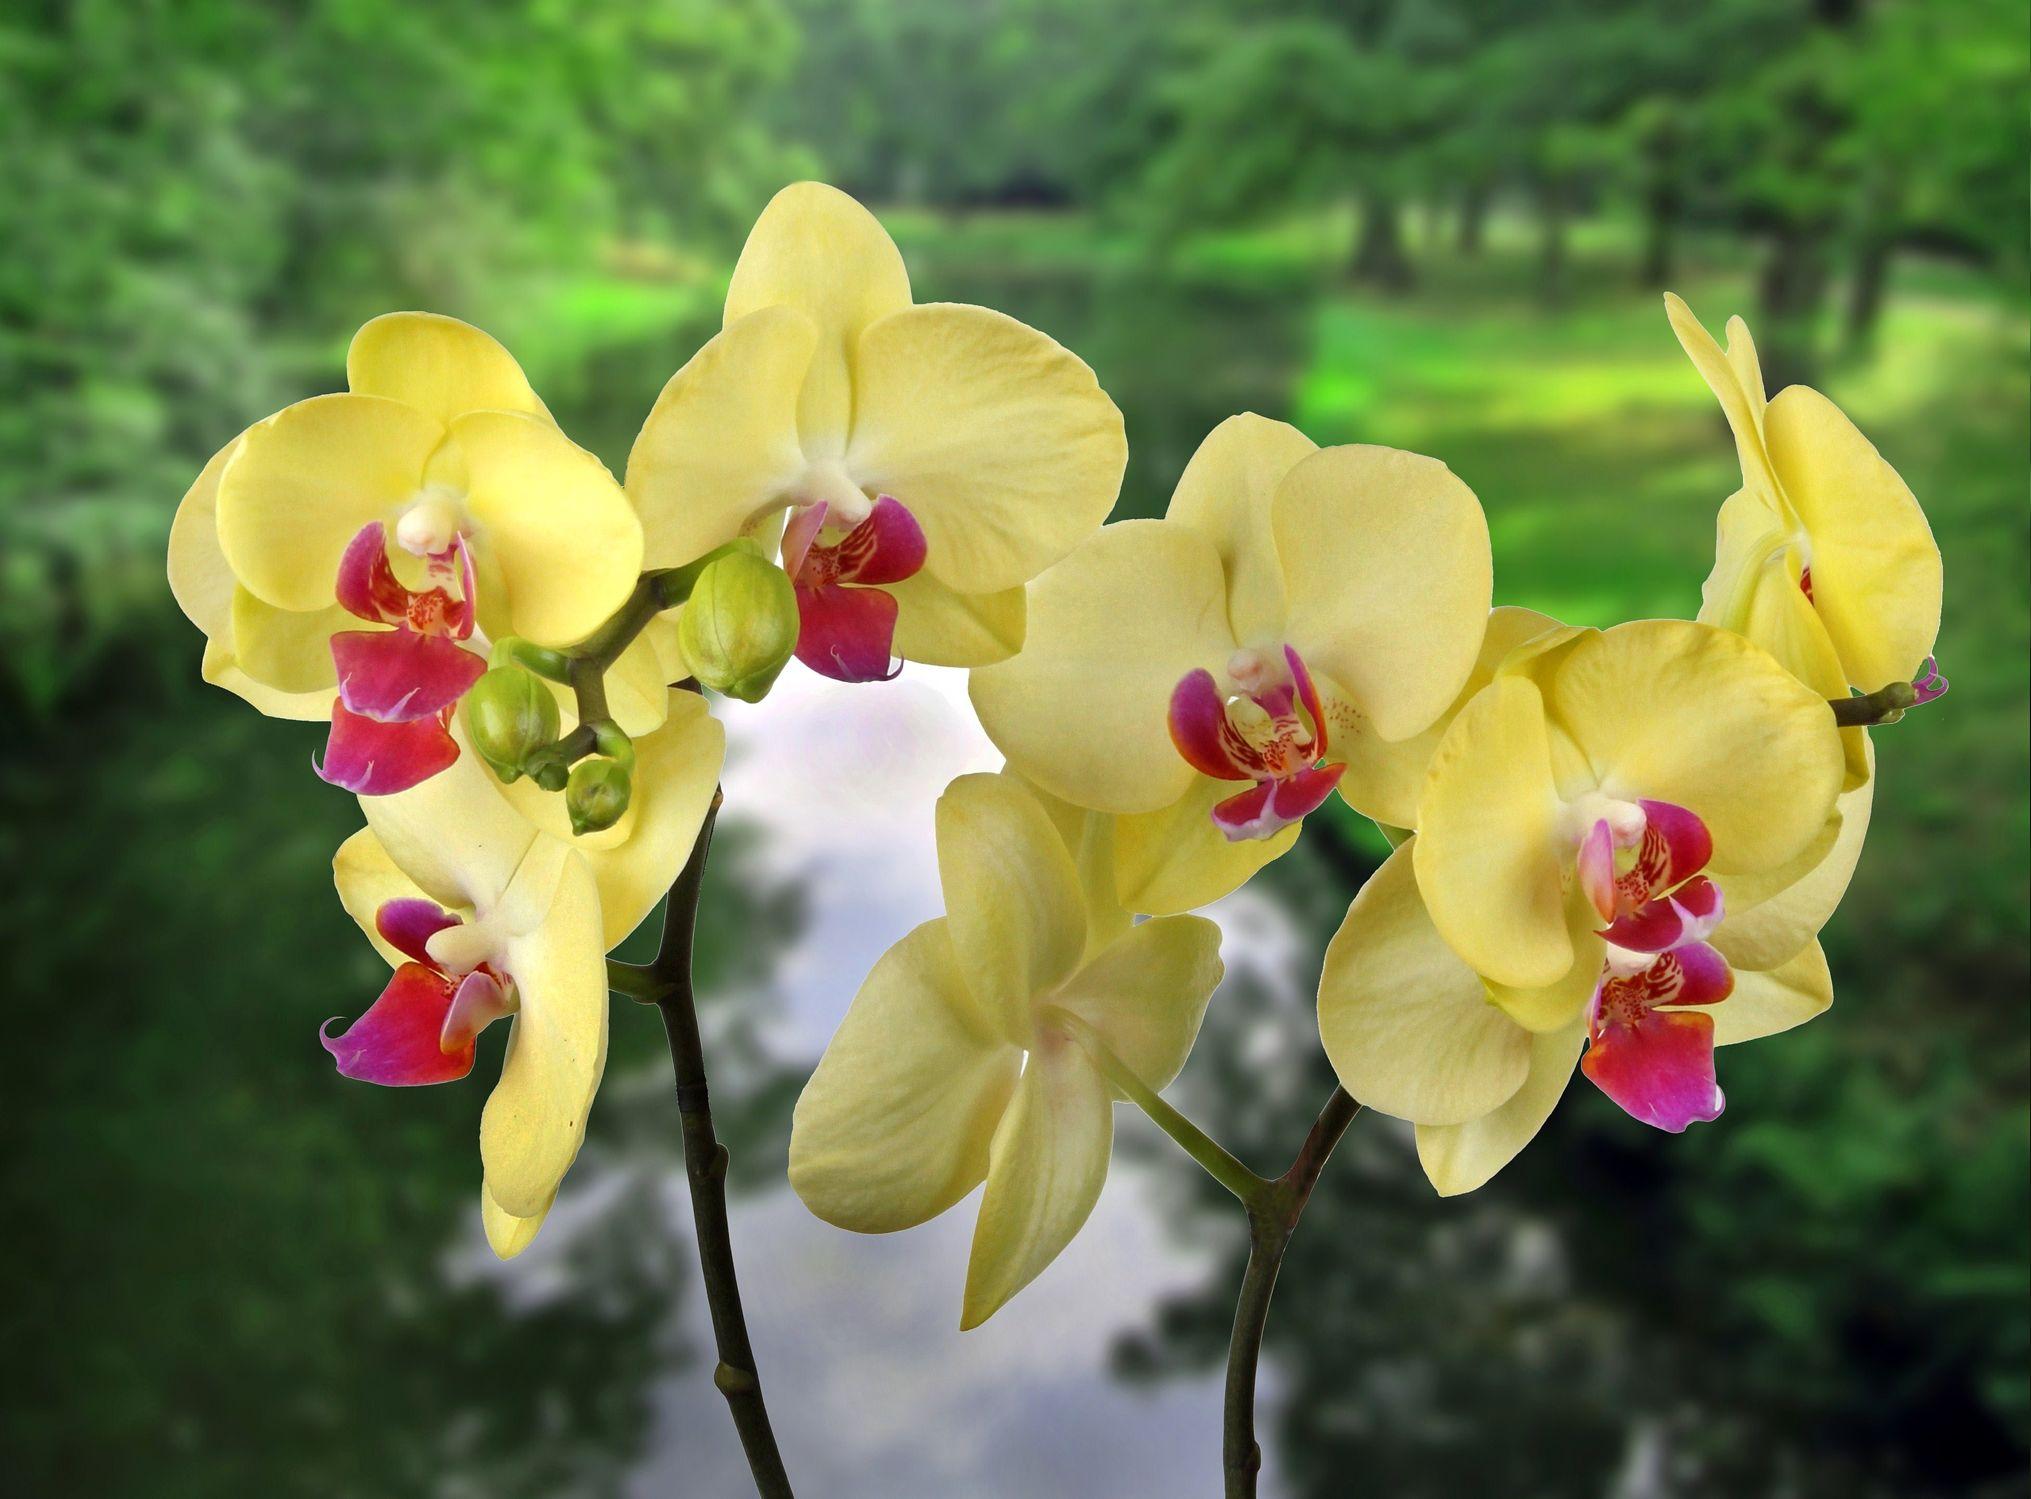 Bild mit Wasser, Pflanzen, Bäume, Blumen, Orchideen, Baum, Blume, Orchidee, Pflanze, Bach, Park, Floral, Stilleben, Blüten, Florales, garten, blüte, Fluss